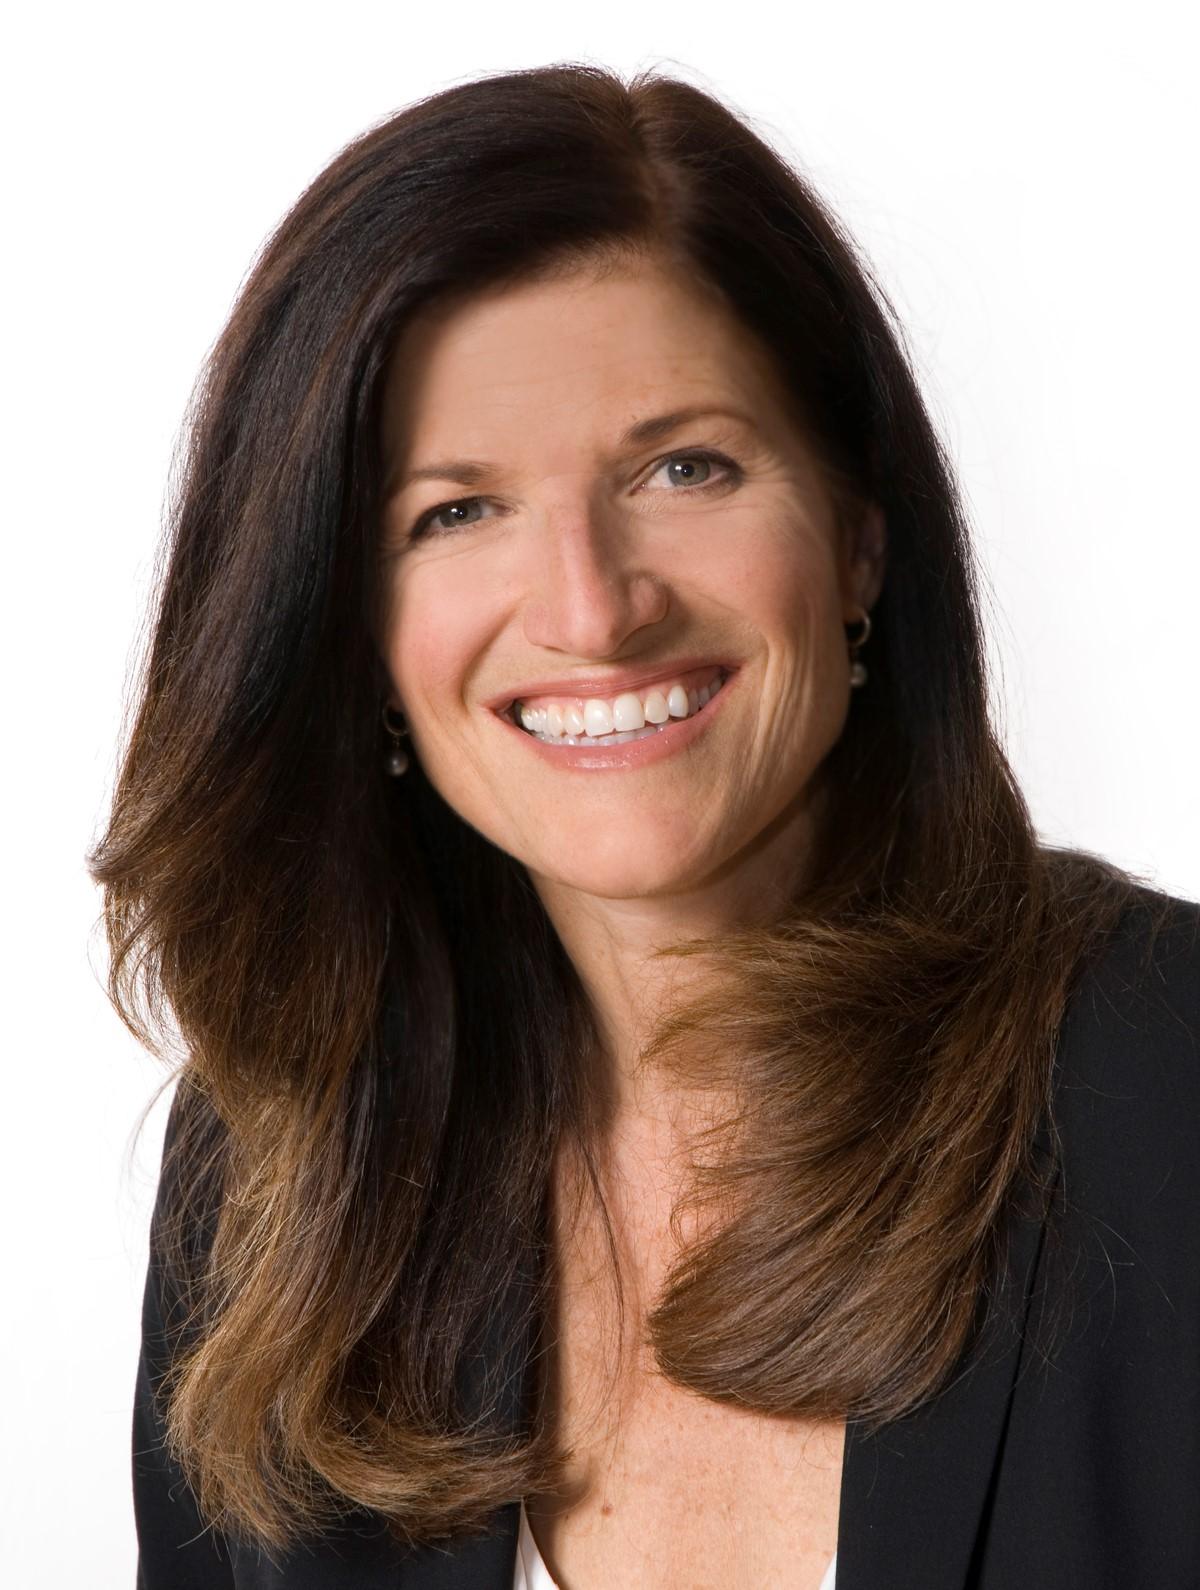 Lisa Farano